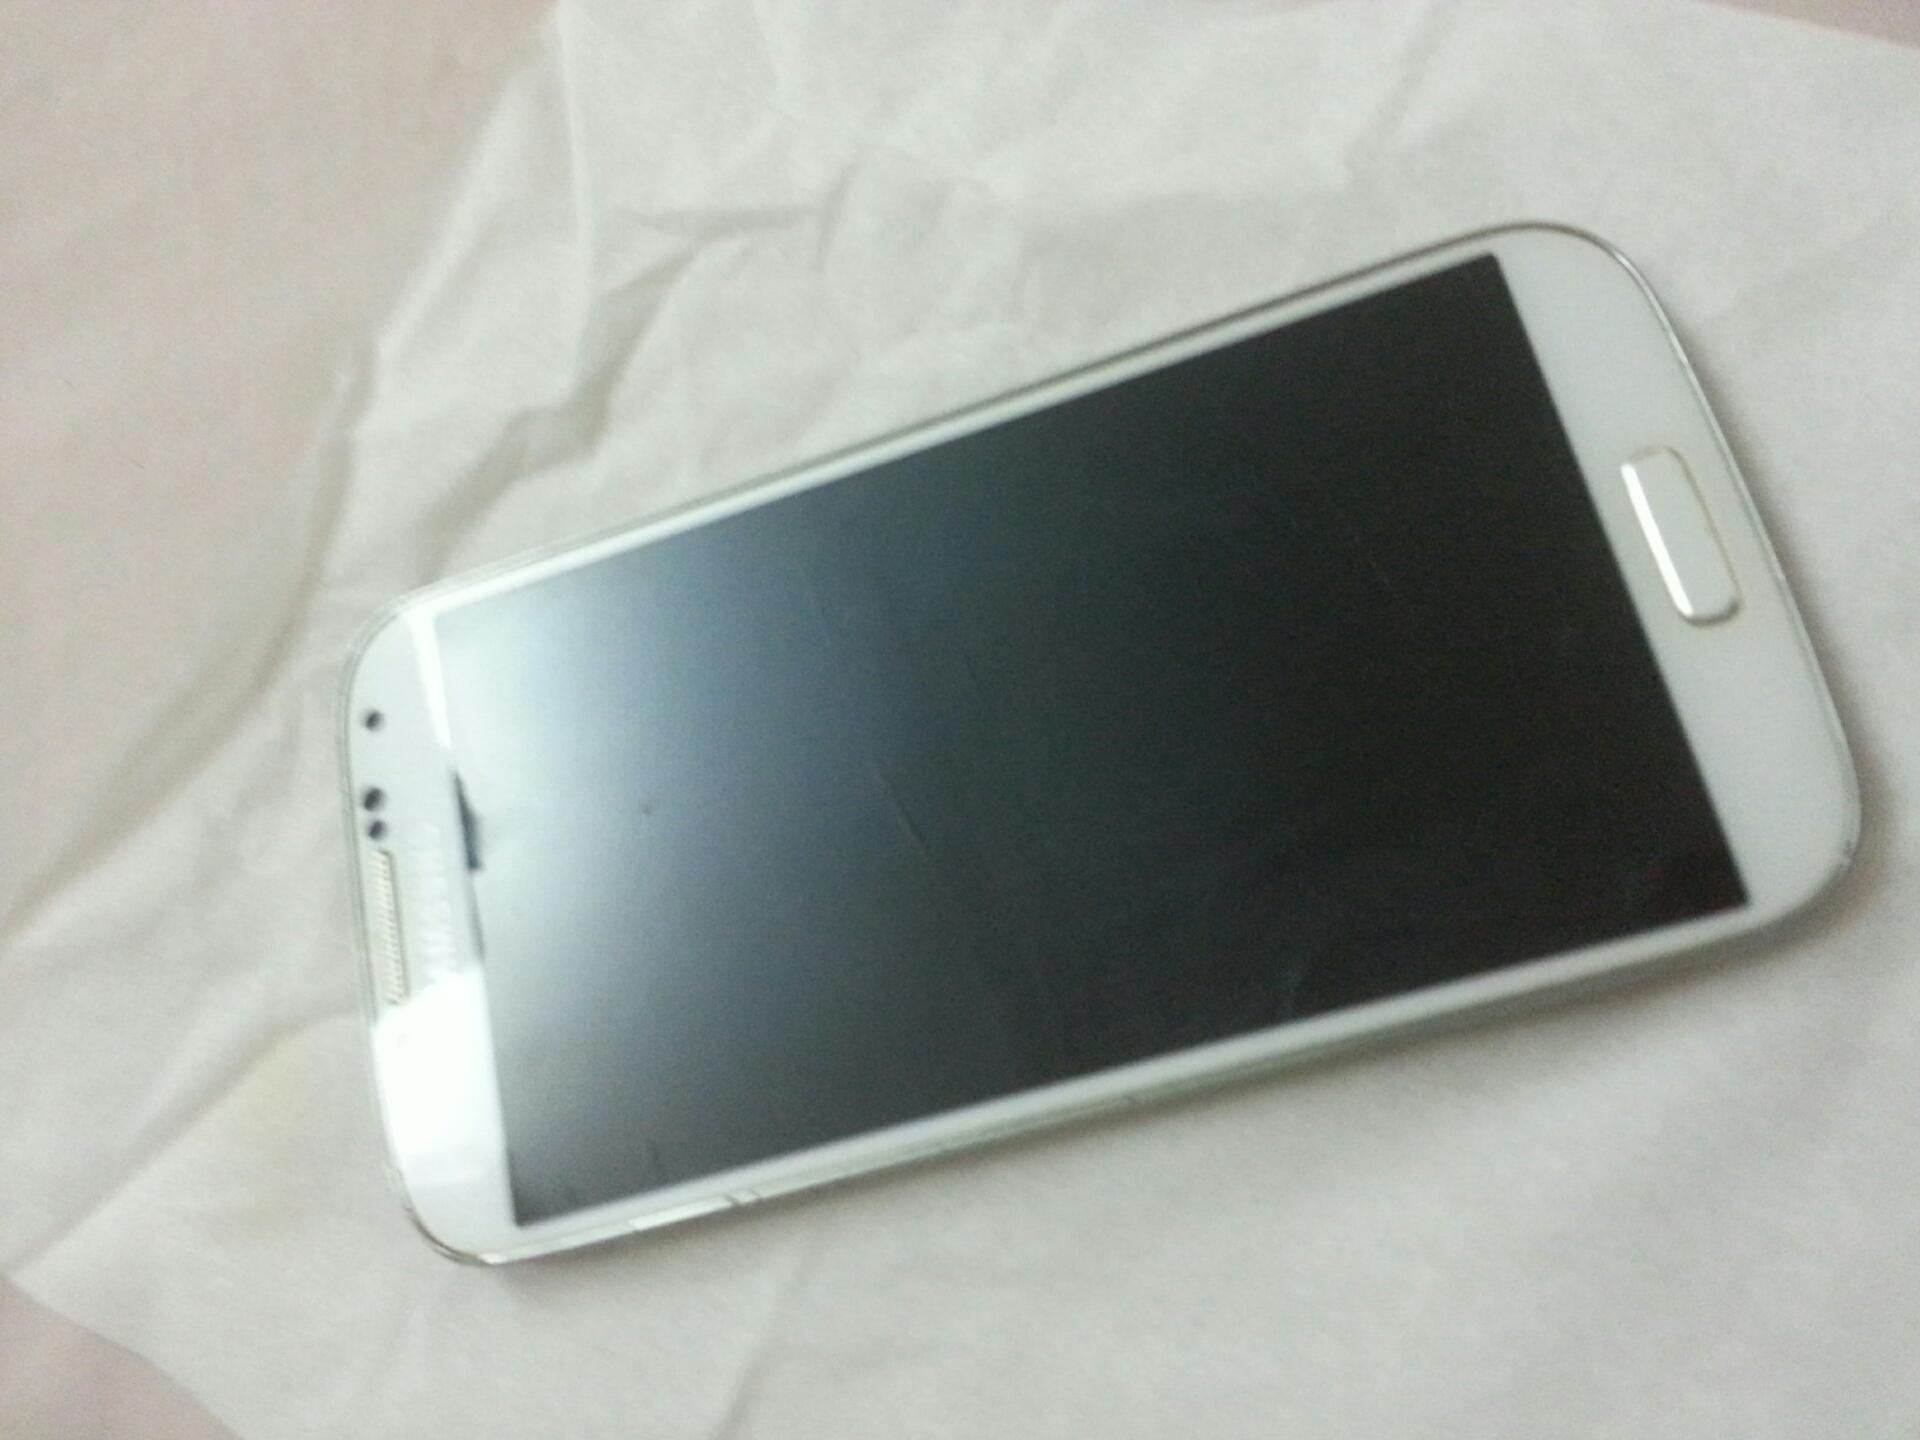 Galaxy note 9 for sale-  S4 تشليح لا تنسَ أنك...